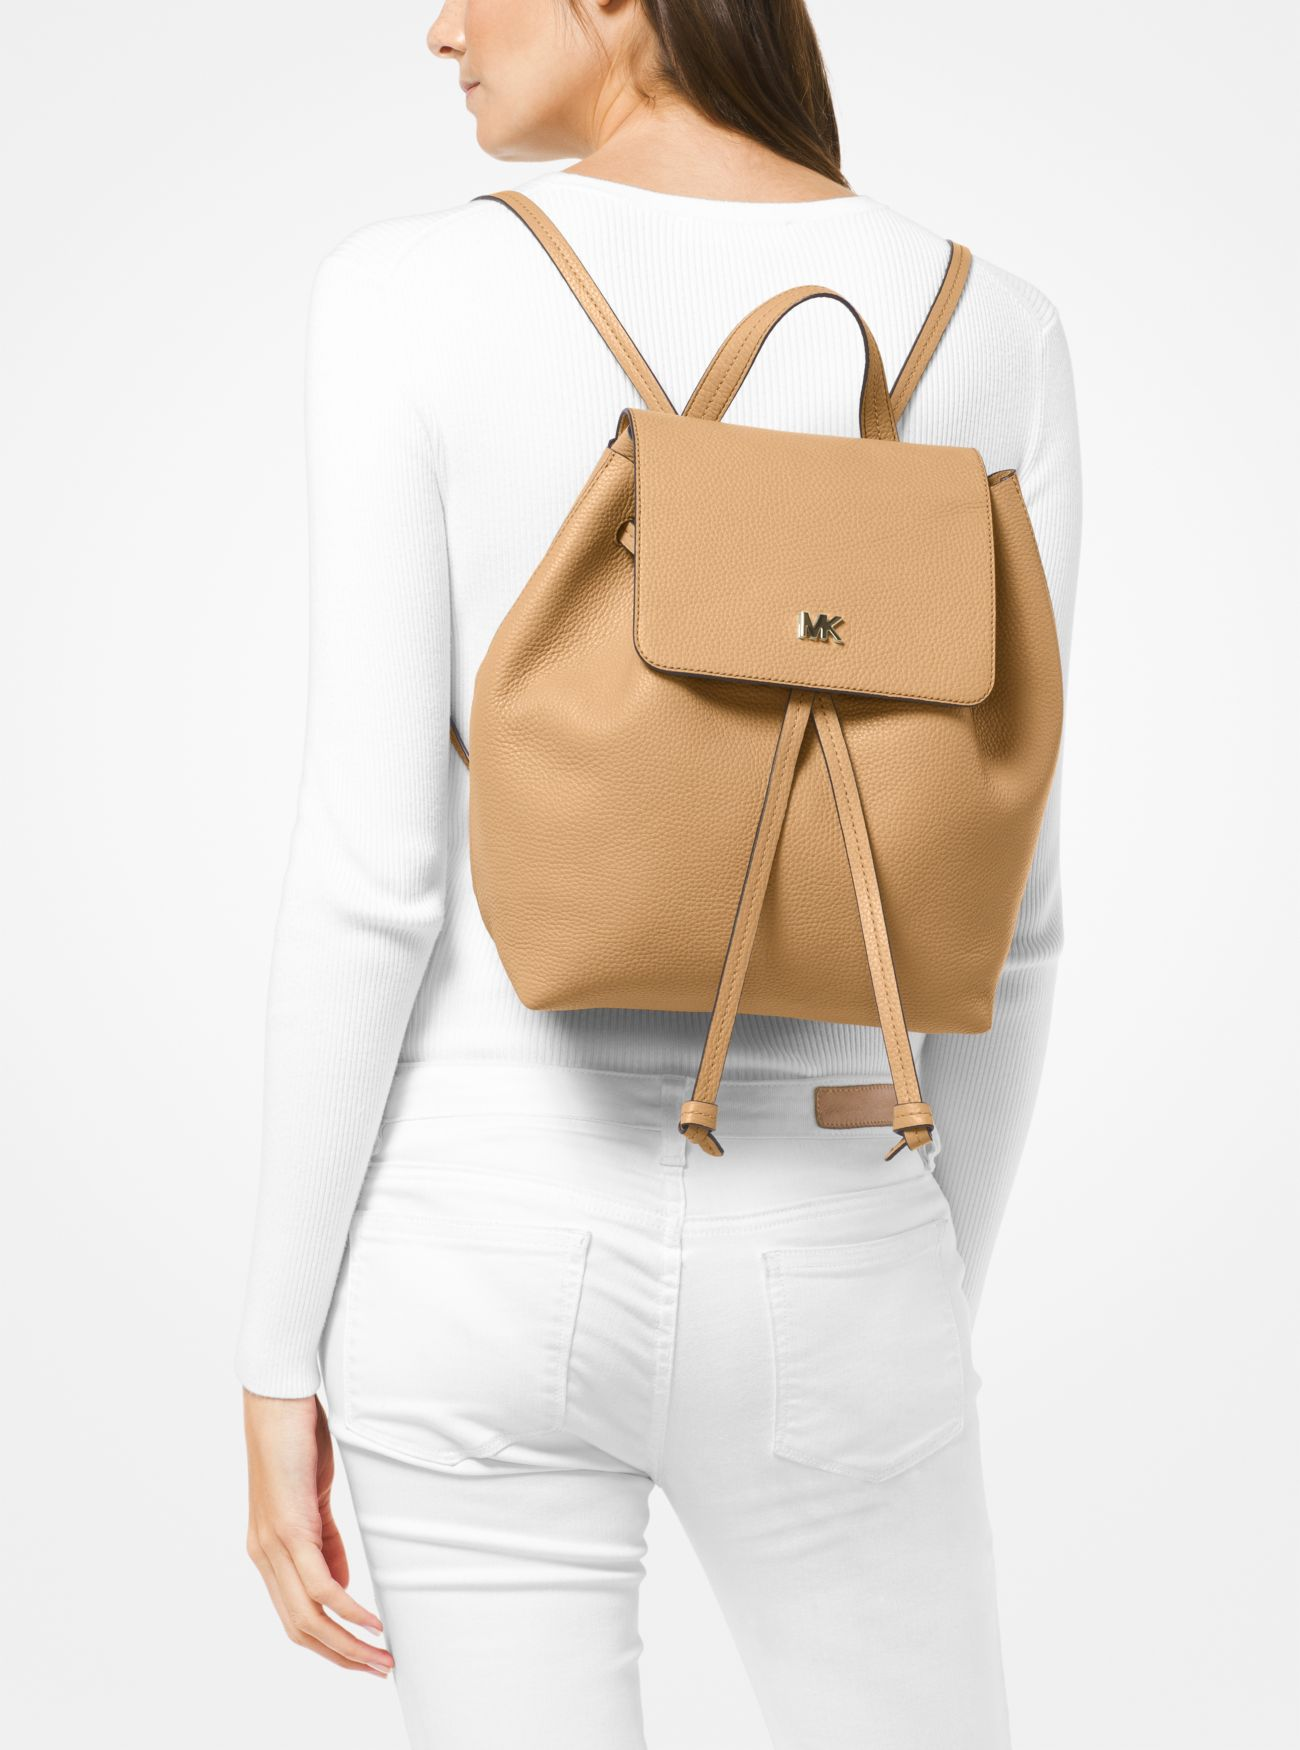 99b30a8fdd2c ... Junie Medium Pebbled Leather Backpack. MICHAEL Michael Kors